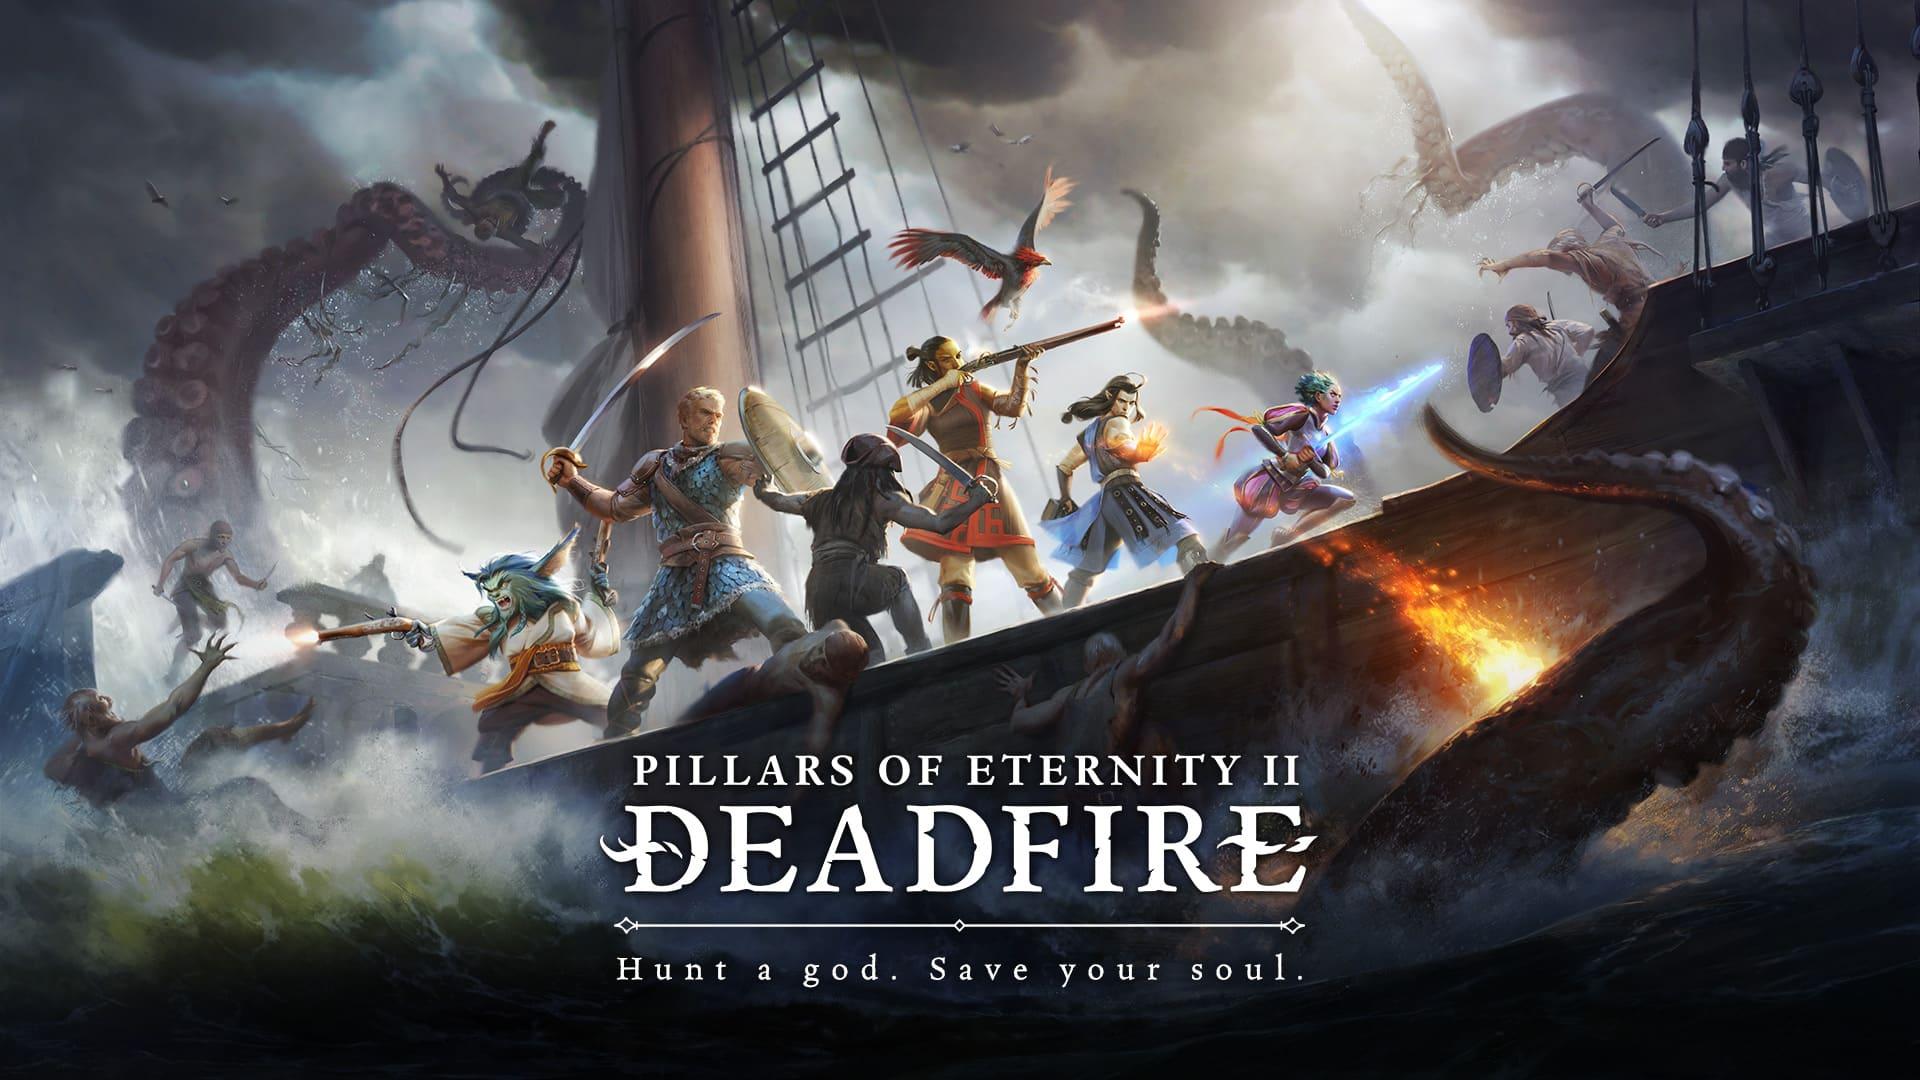 Pillars of Eternity II: Deadfire telecharger gratuit de PC et Torrent